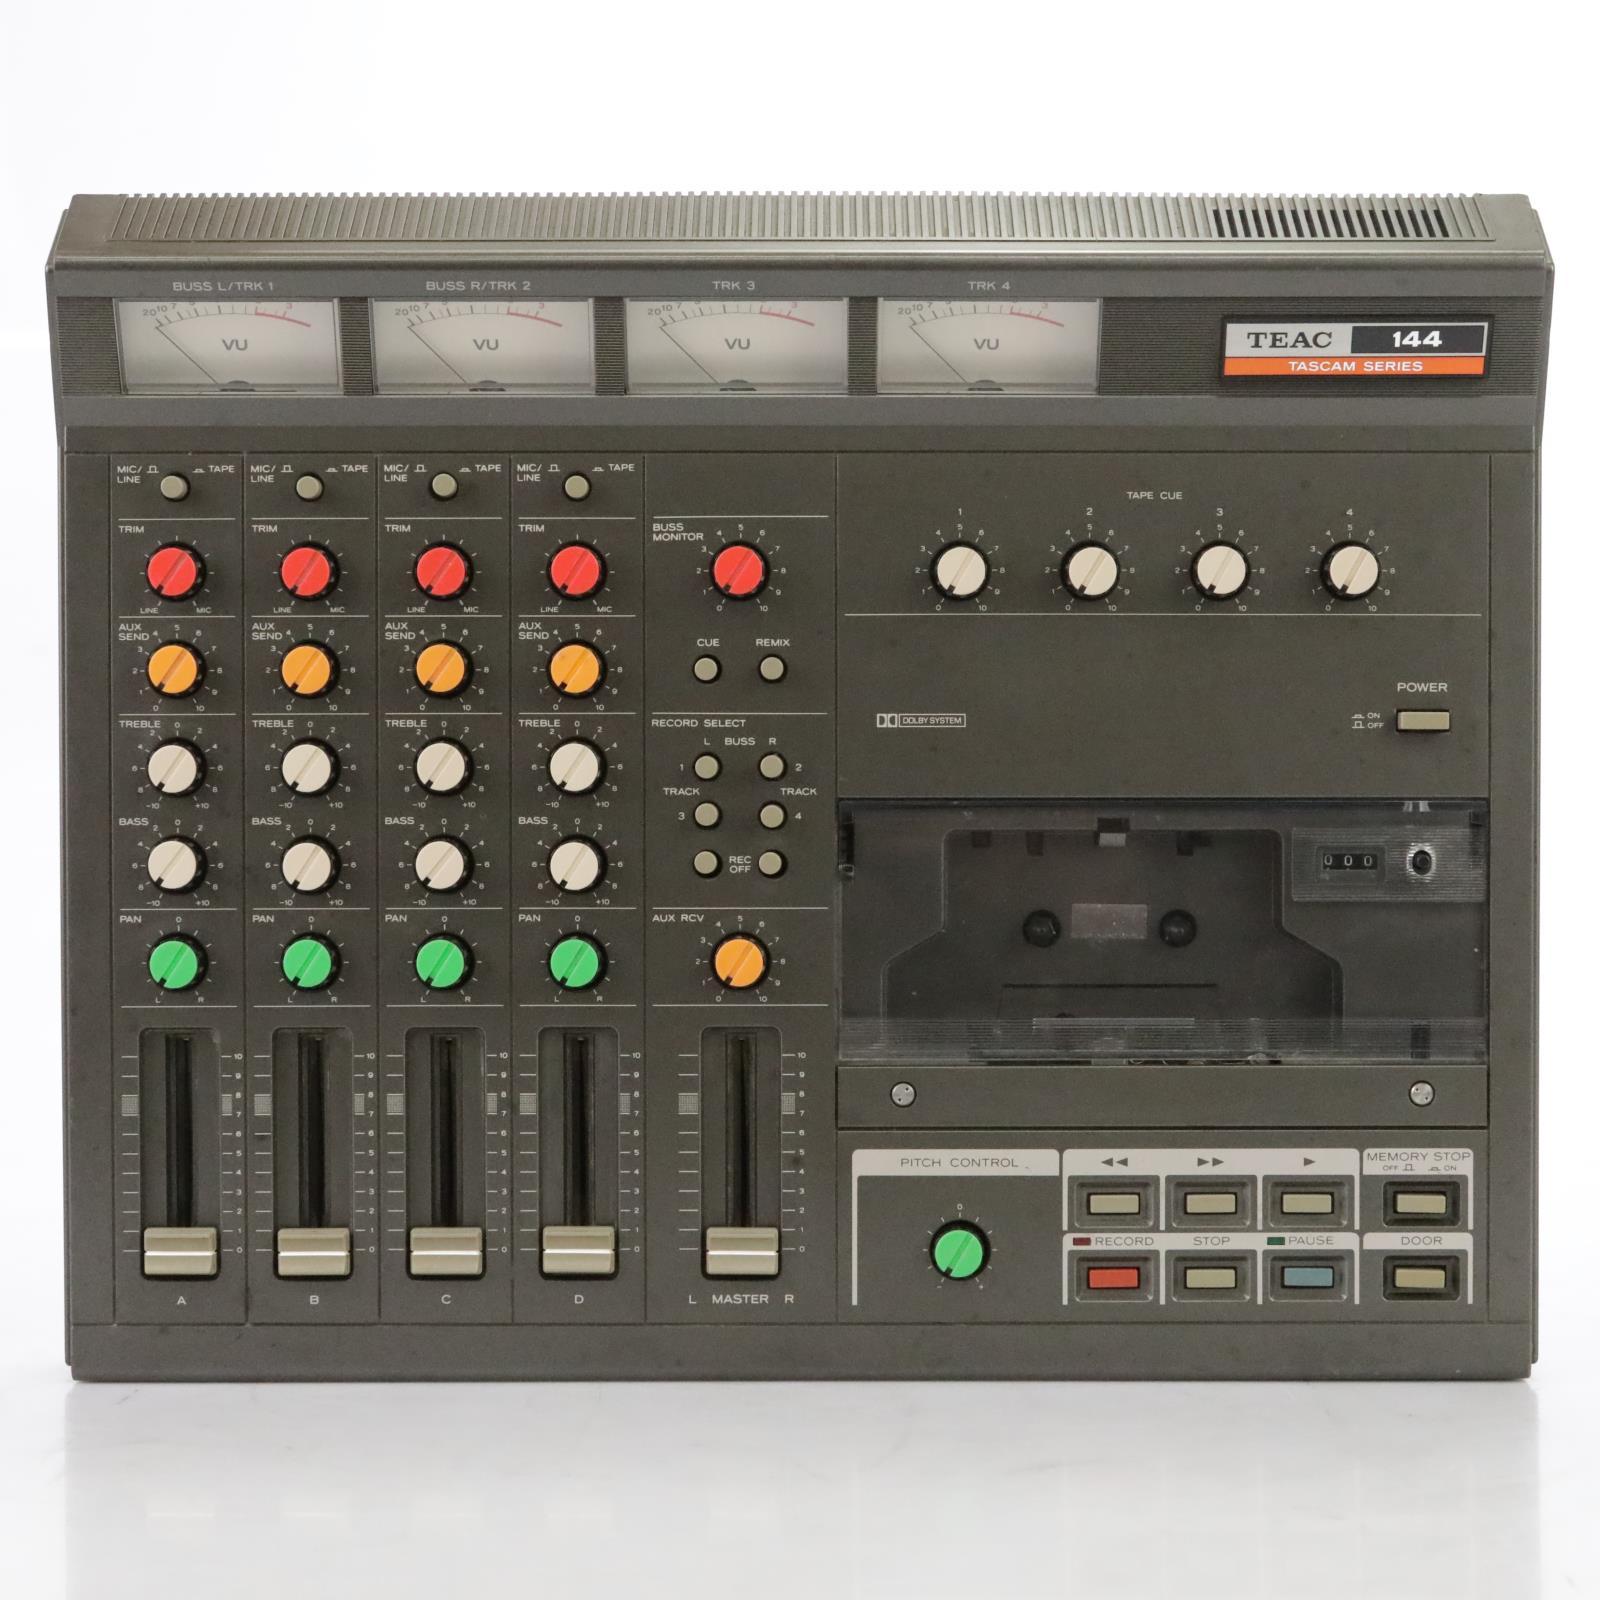 Teac Tascam 144 Porta-Studio Cassette Tape Recorder 220V David Roback #44695